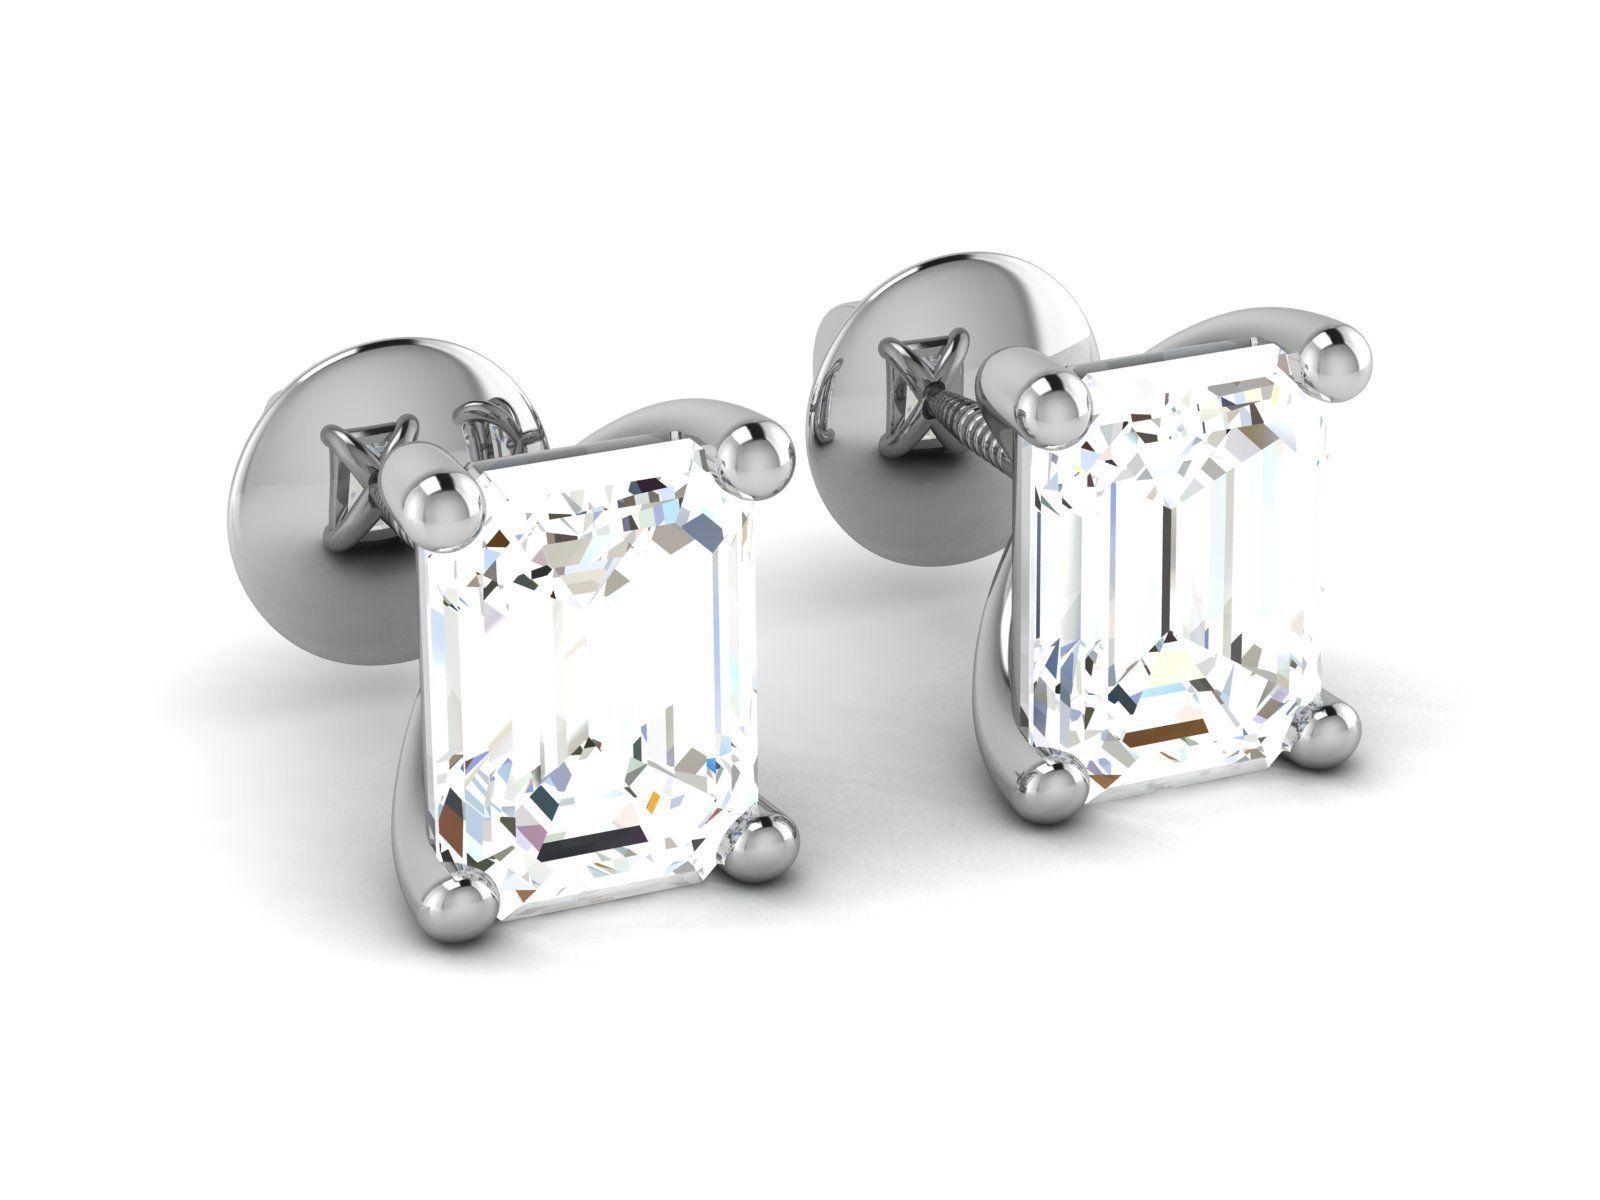 Solitaire earrings 3dm stl render detail 3D print model